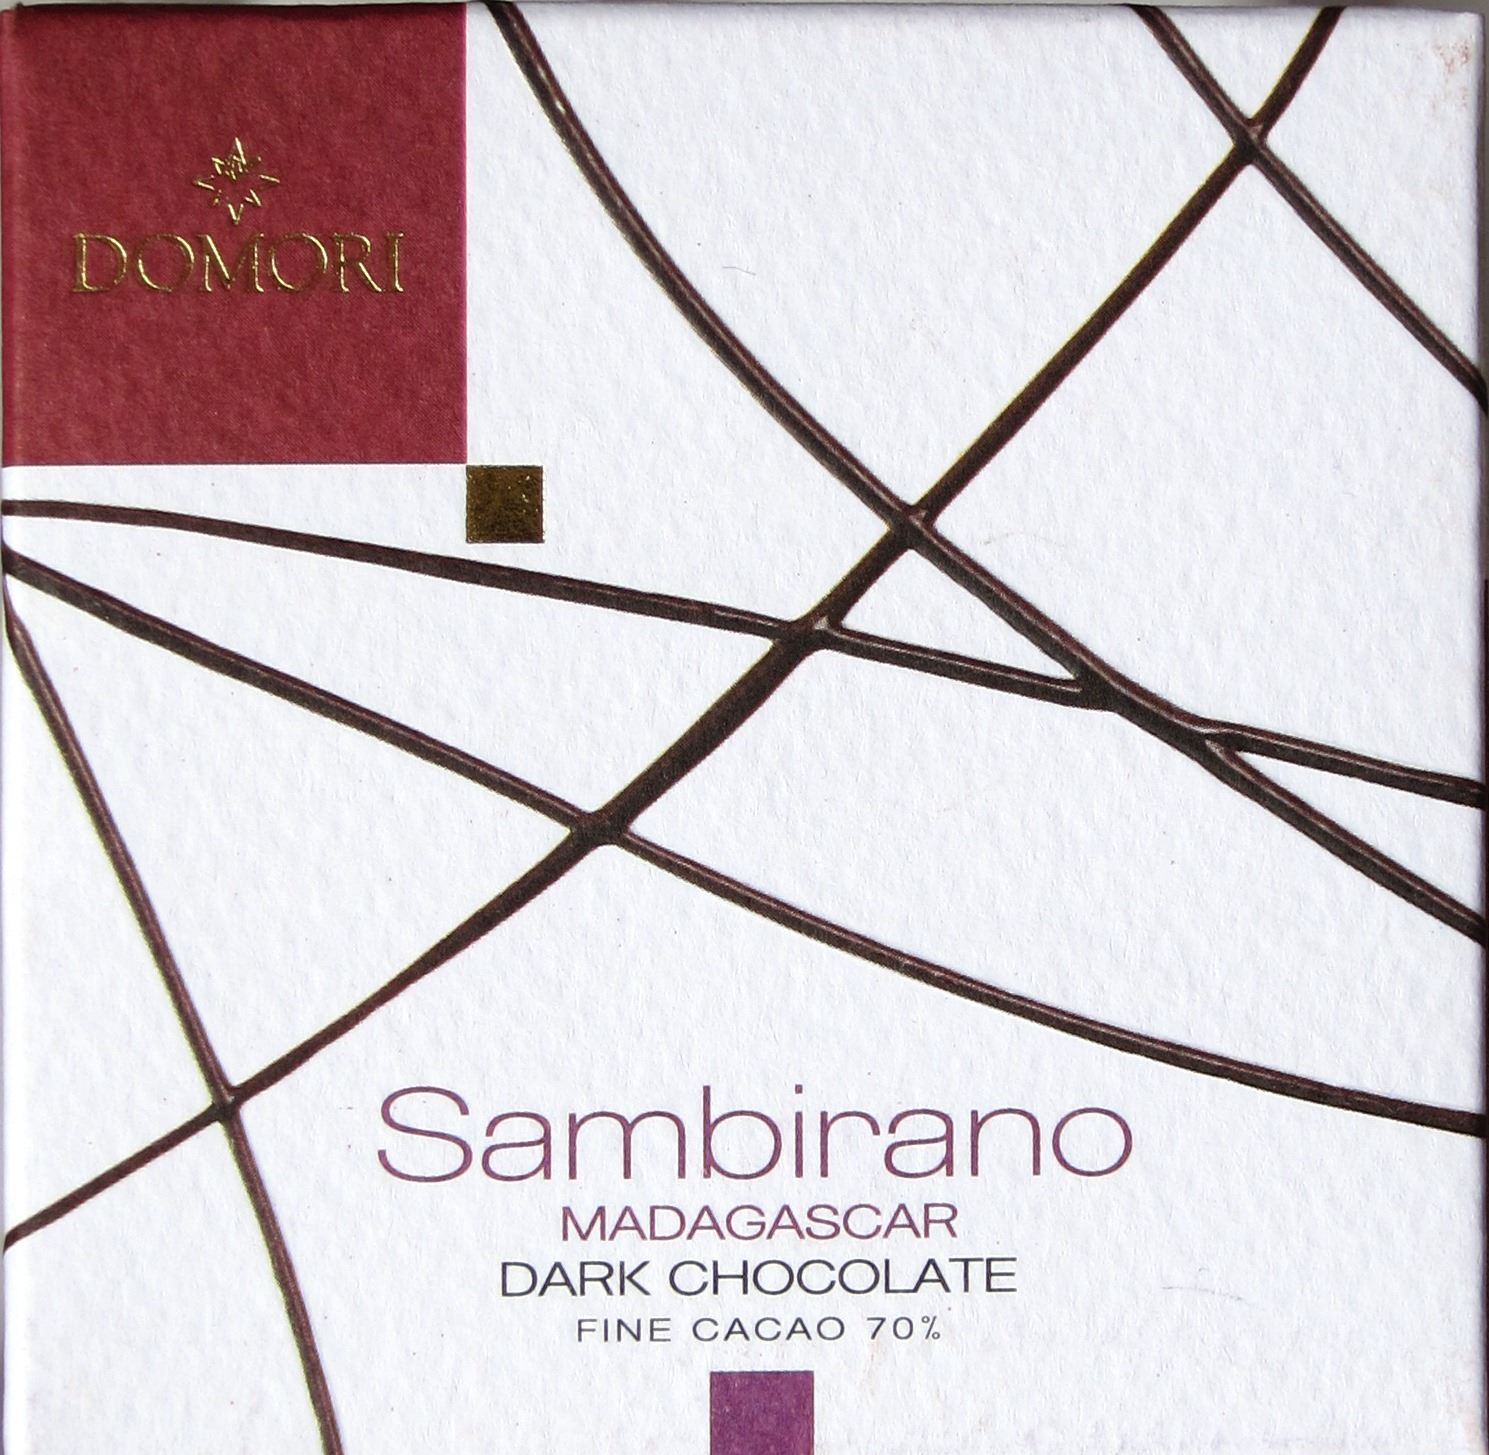 Domori Sambirano: Madagaskar-Bitterschokolade